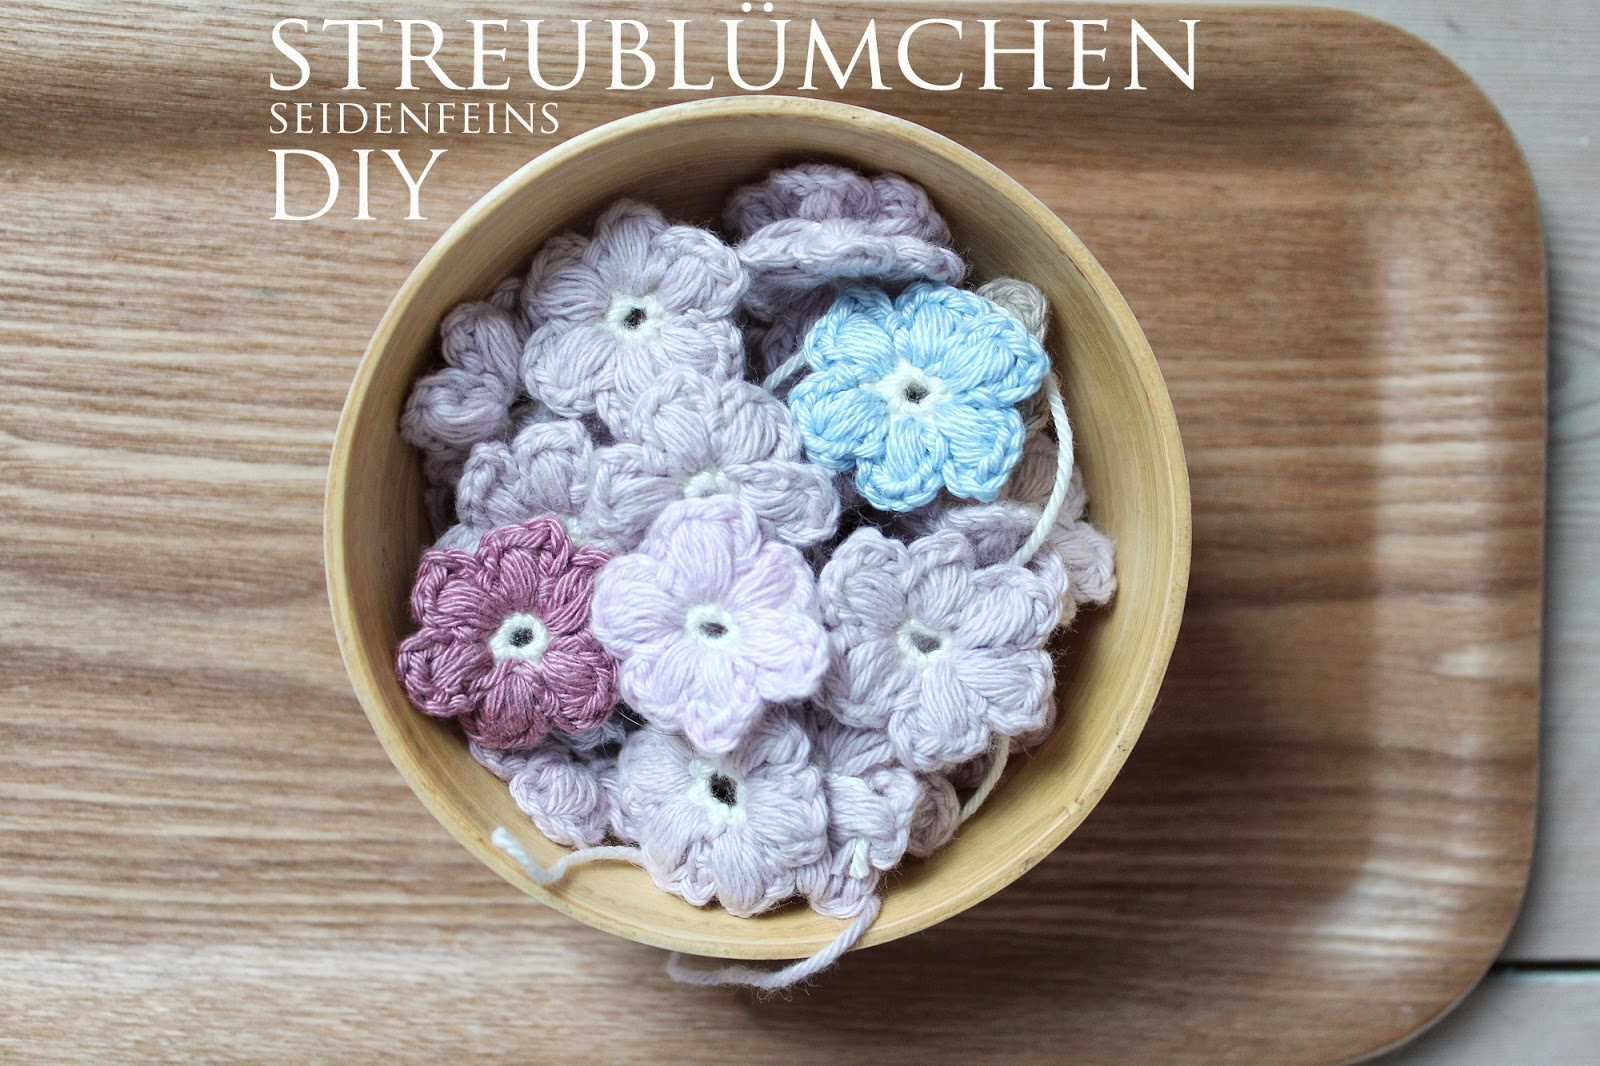 seidenfeins dekoblog streubl mchen h keln diy crochet little daisys. Black Bedroom Furniture Sets. Home Design Ideas